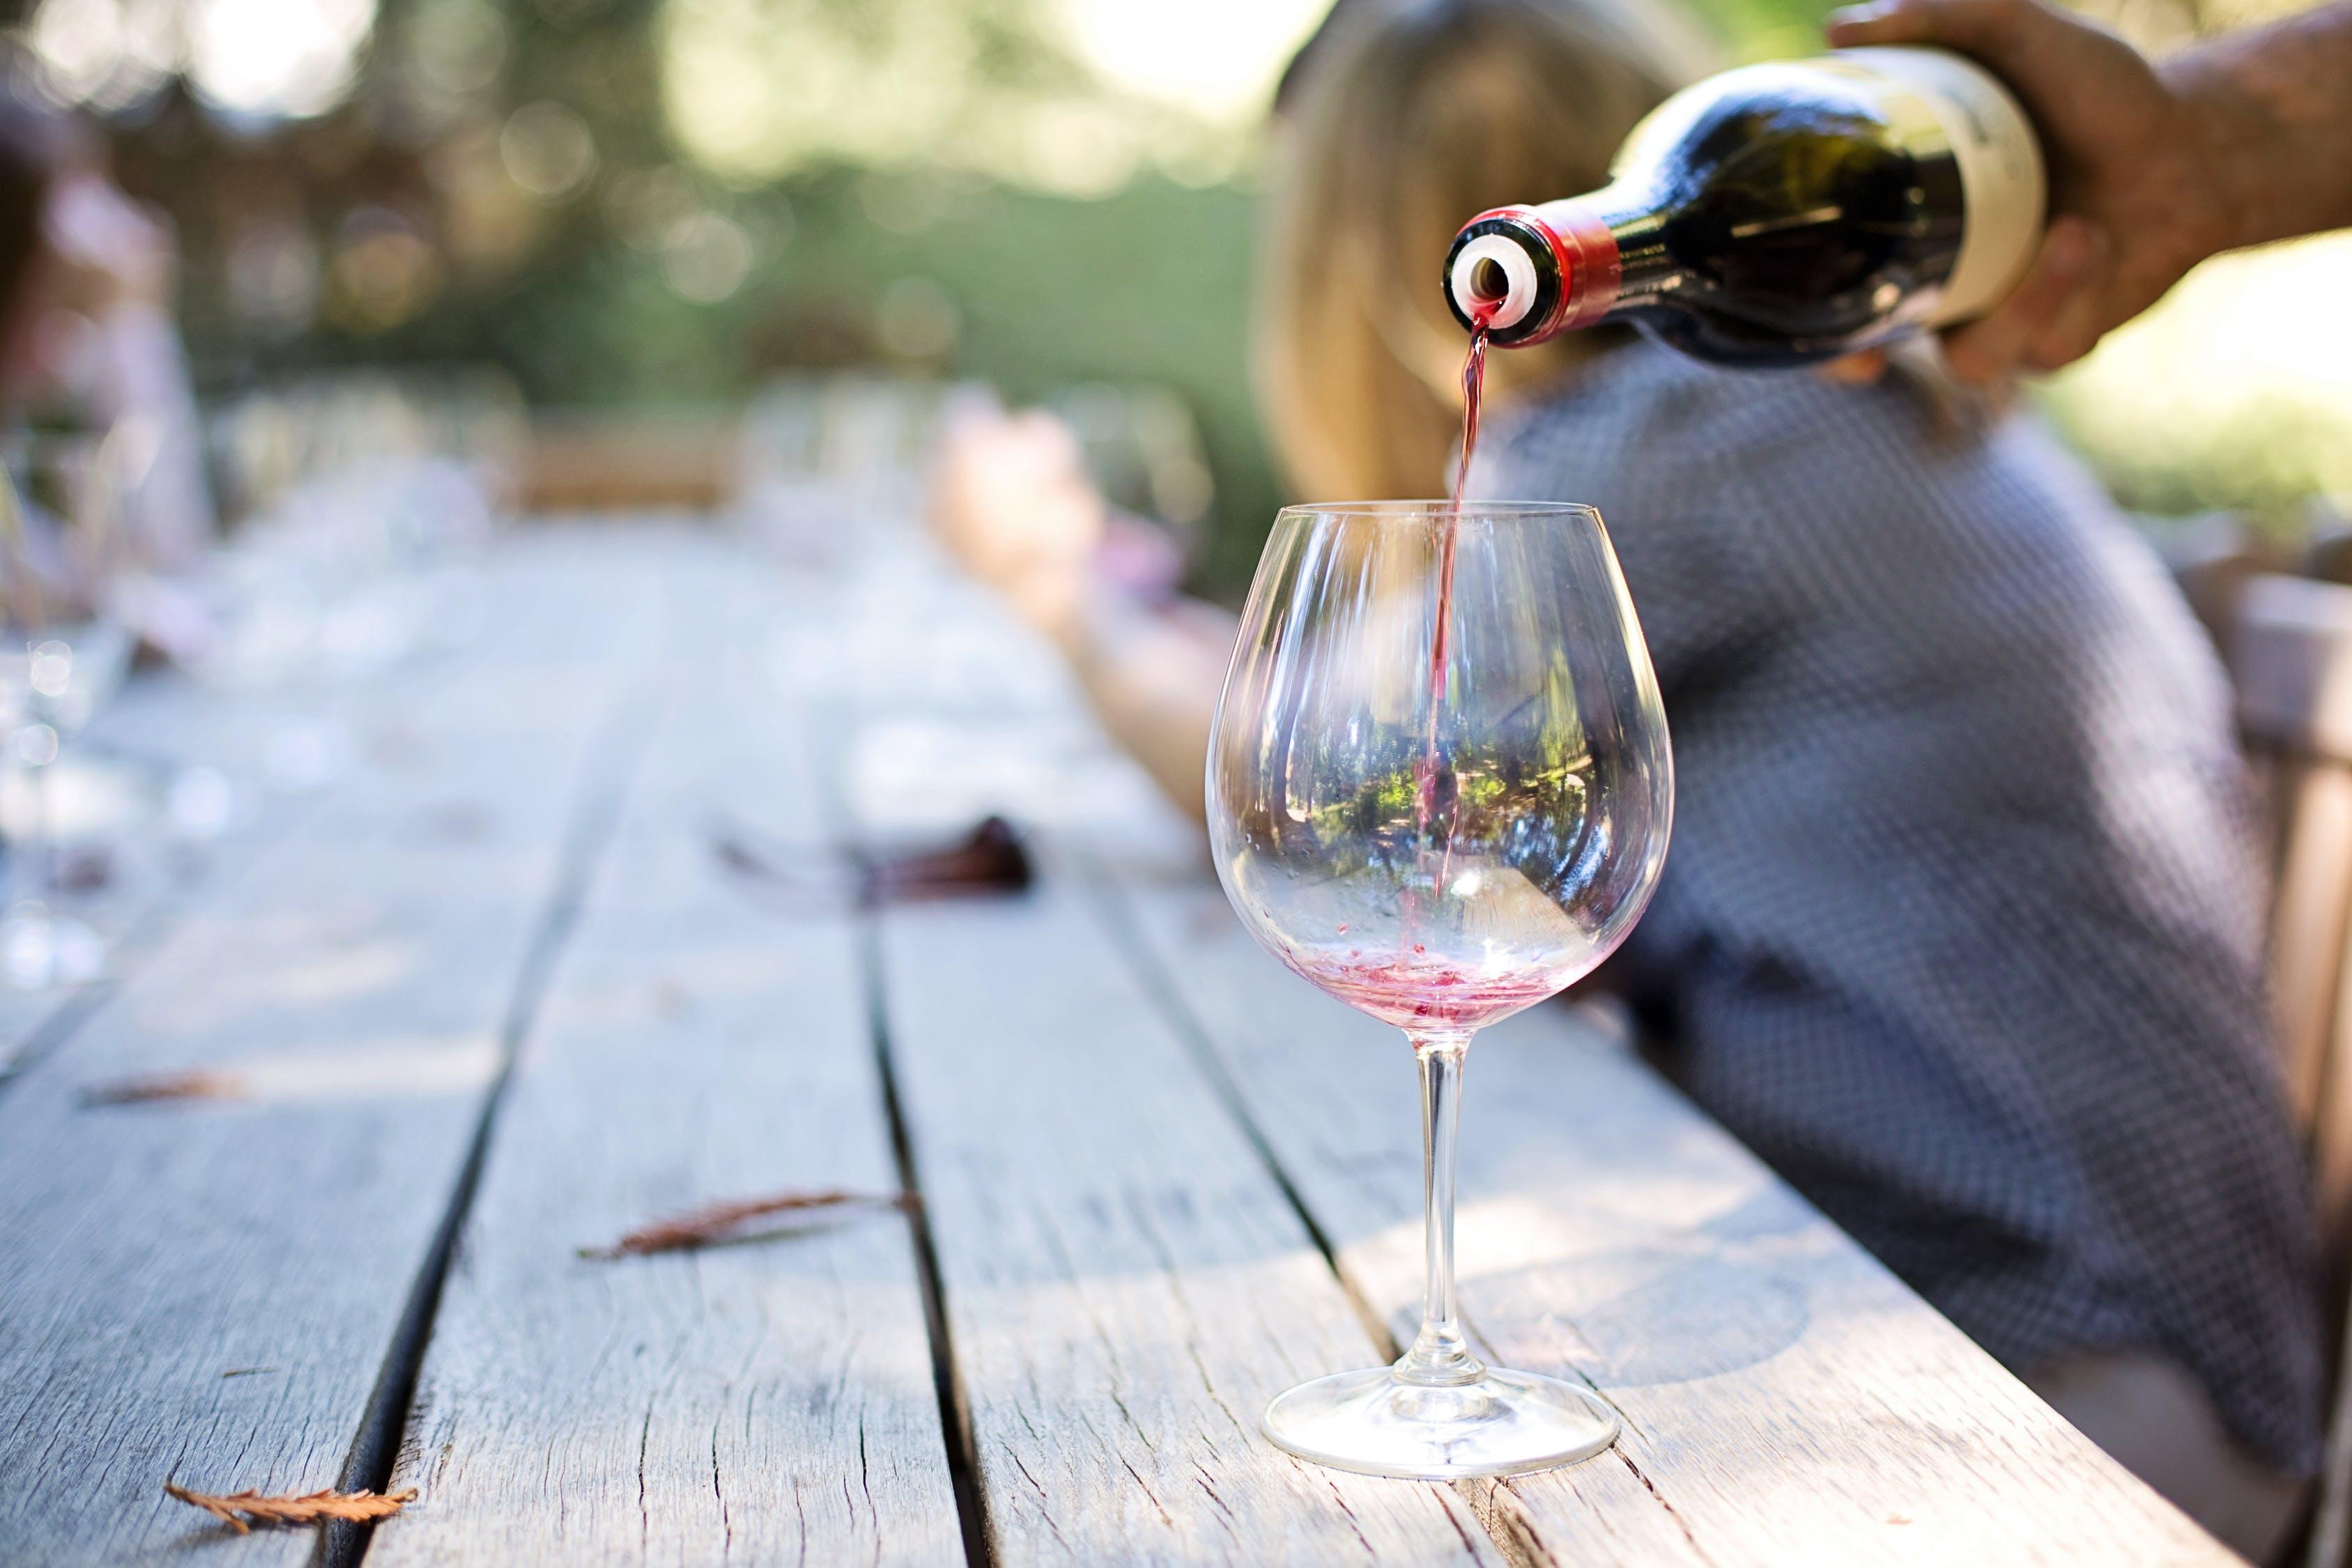 Rental Bathroom Trailers Elevate Guest Experience at Wineries and Vineyards